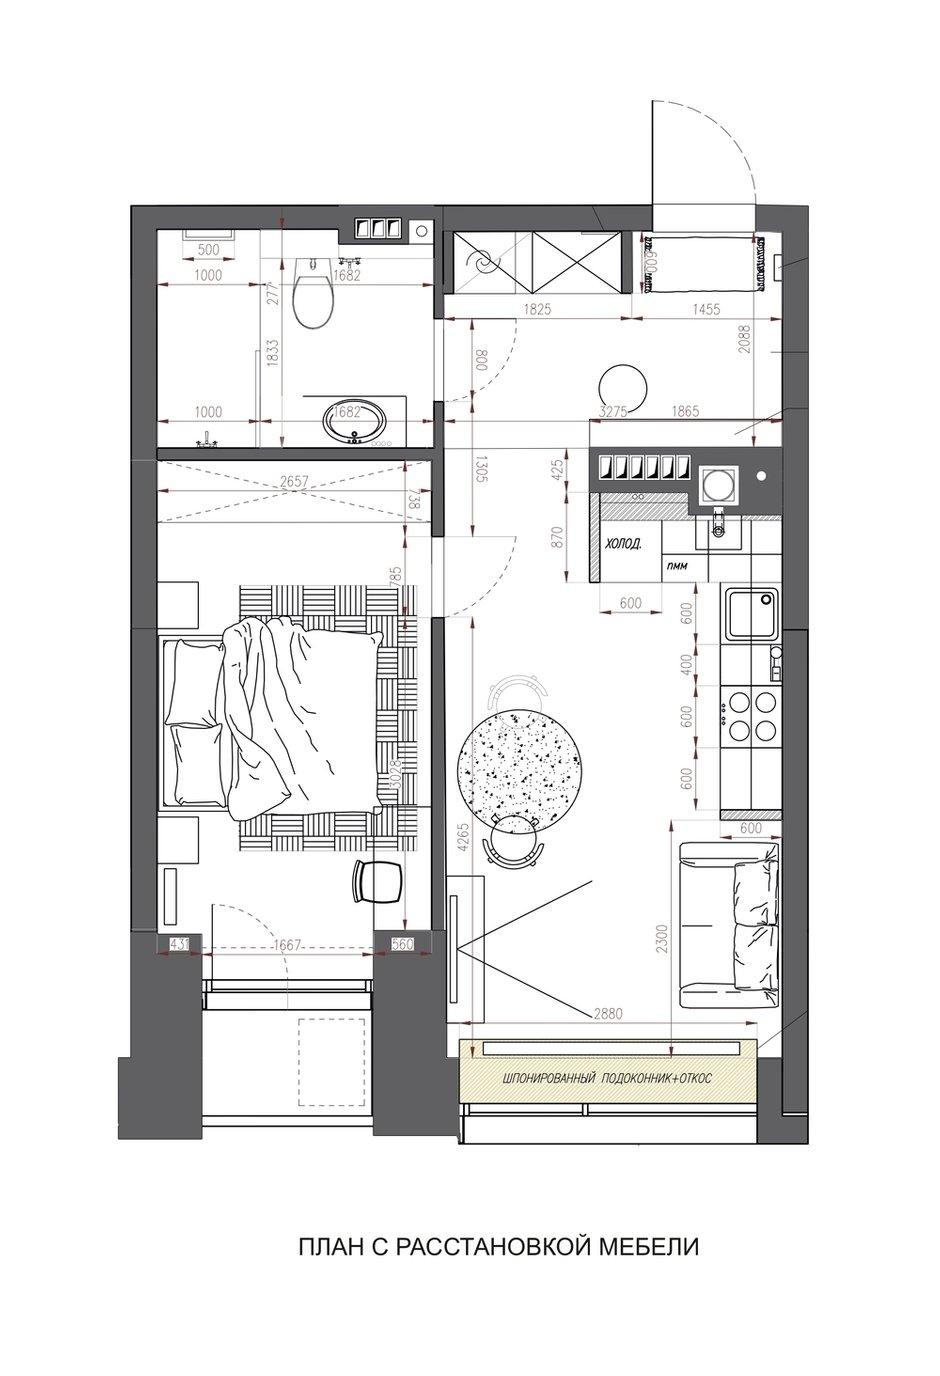 Фотография: Планировки в стиле , Современный, Квартира, Проект недели, Москва, 1 комната, 40-60 метров, Аделина Шарапова – фото на INMYROOM